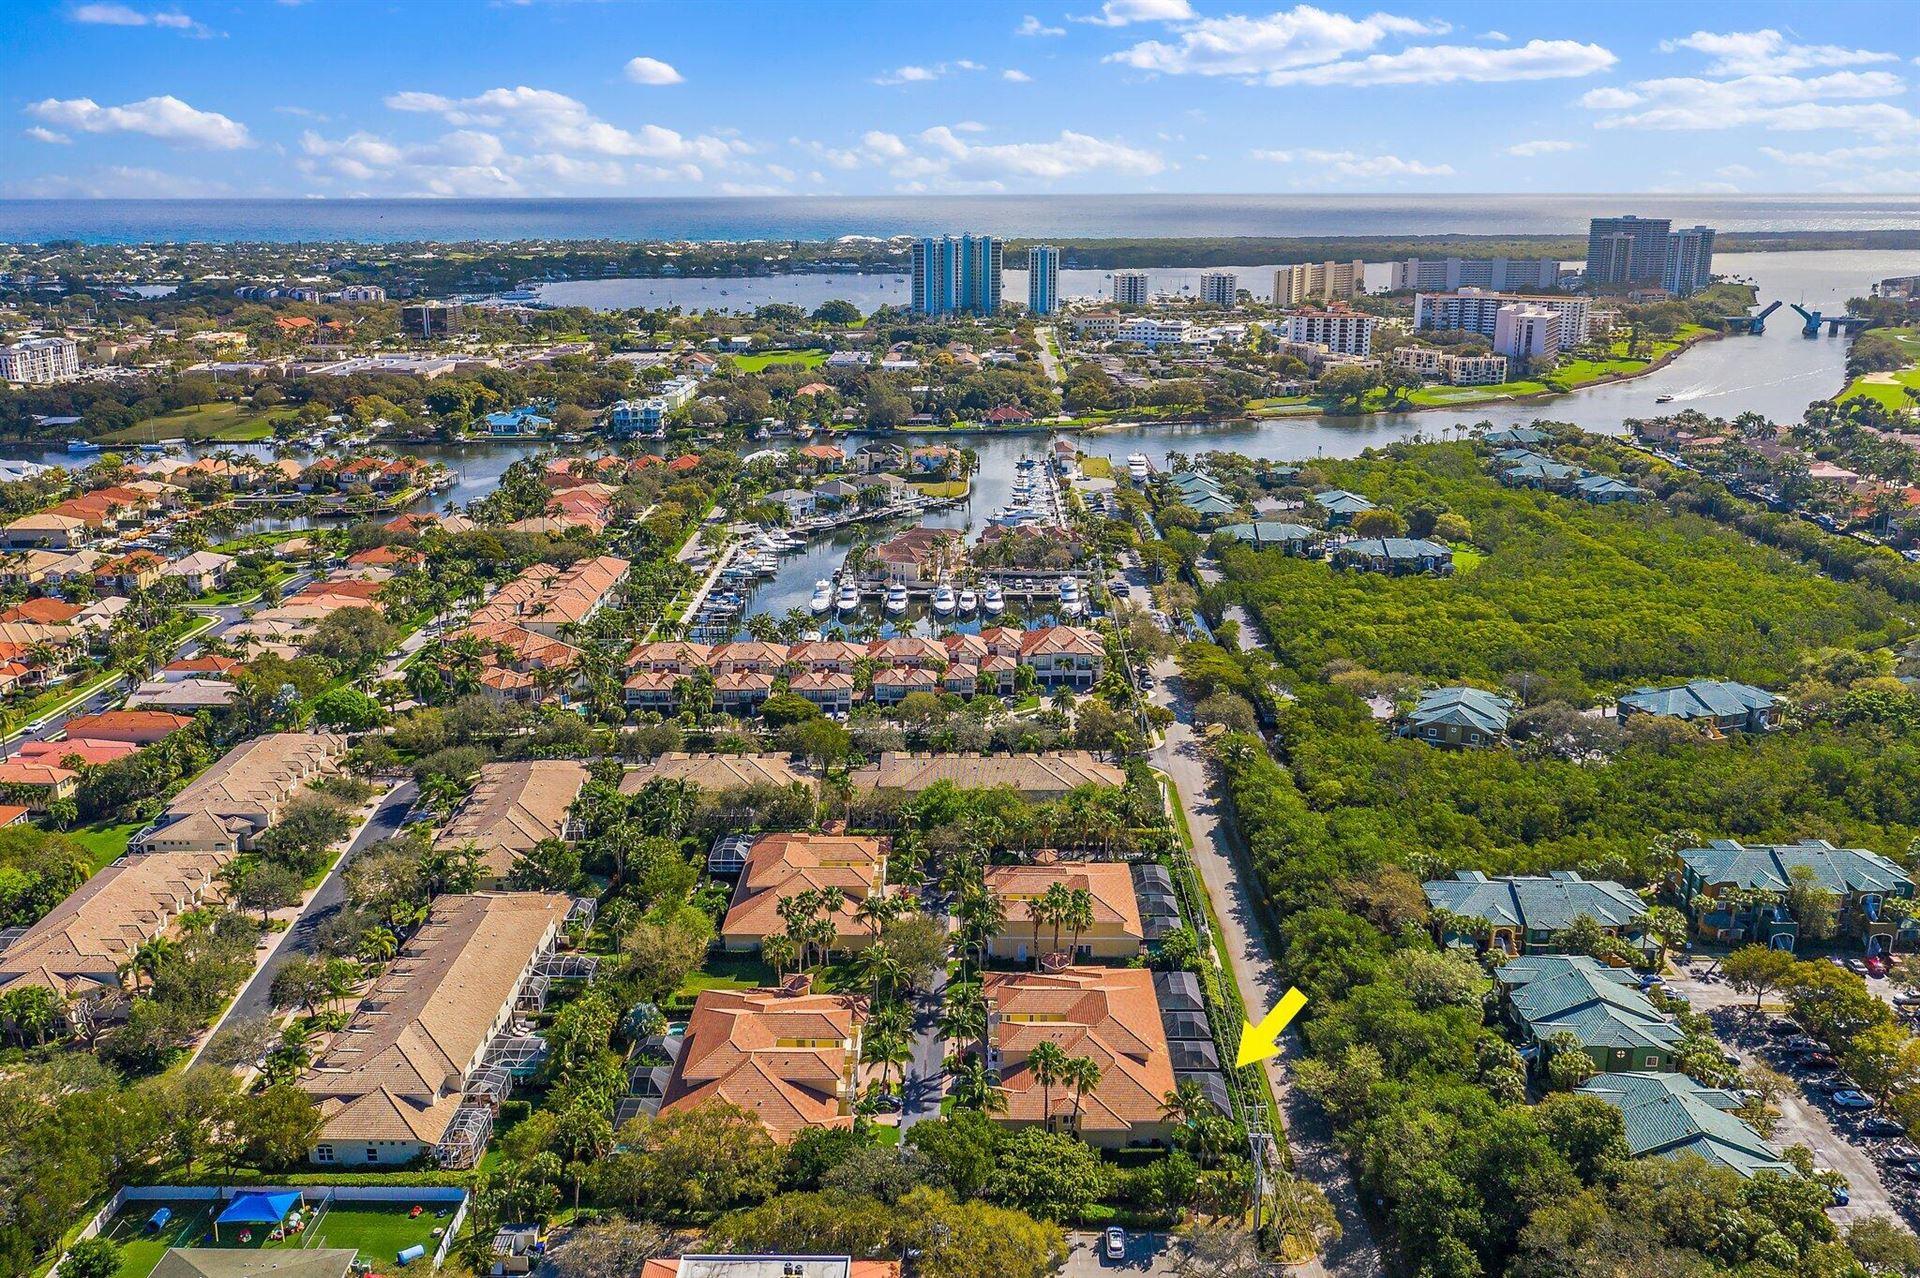 Photo of 107 Renaissance Drive, North Palm Beach, FL 33410 (MLS # RX-10697997)